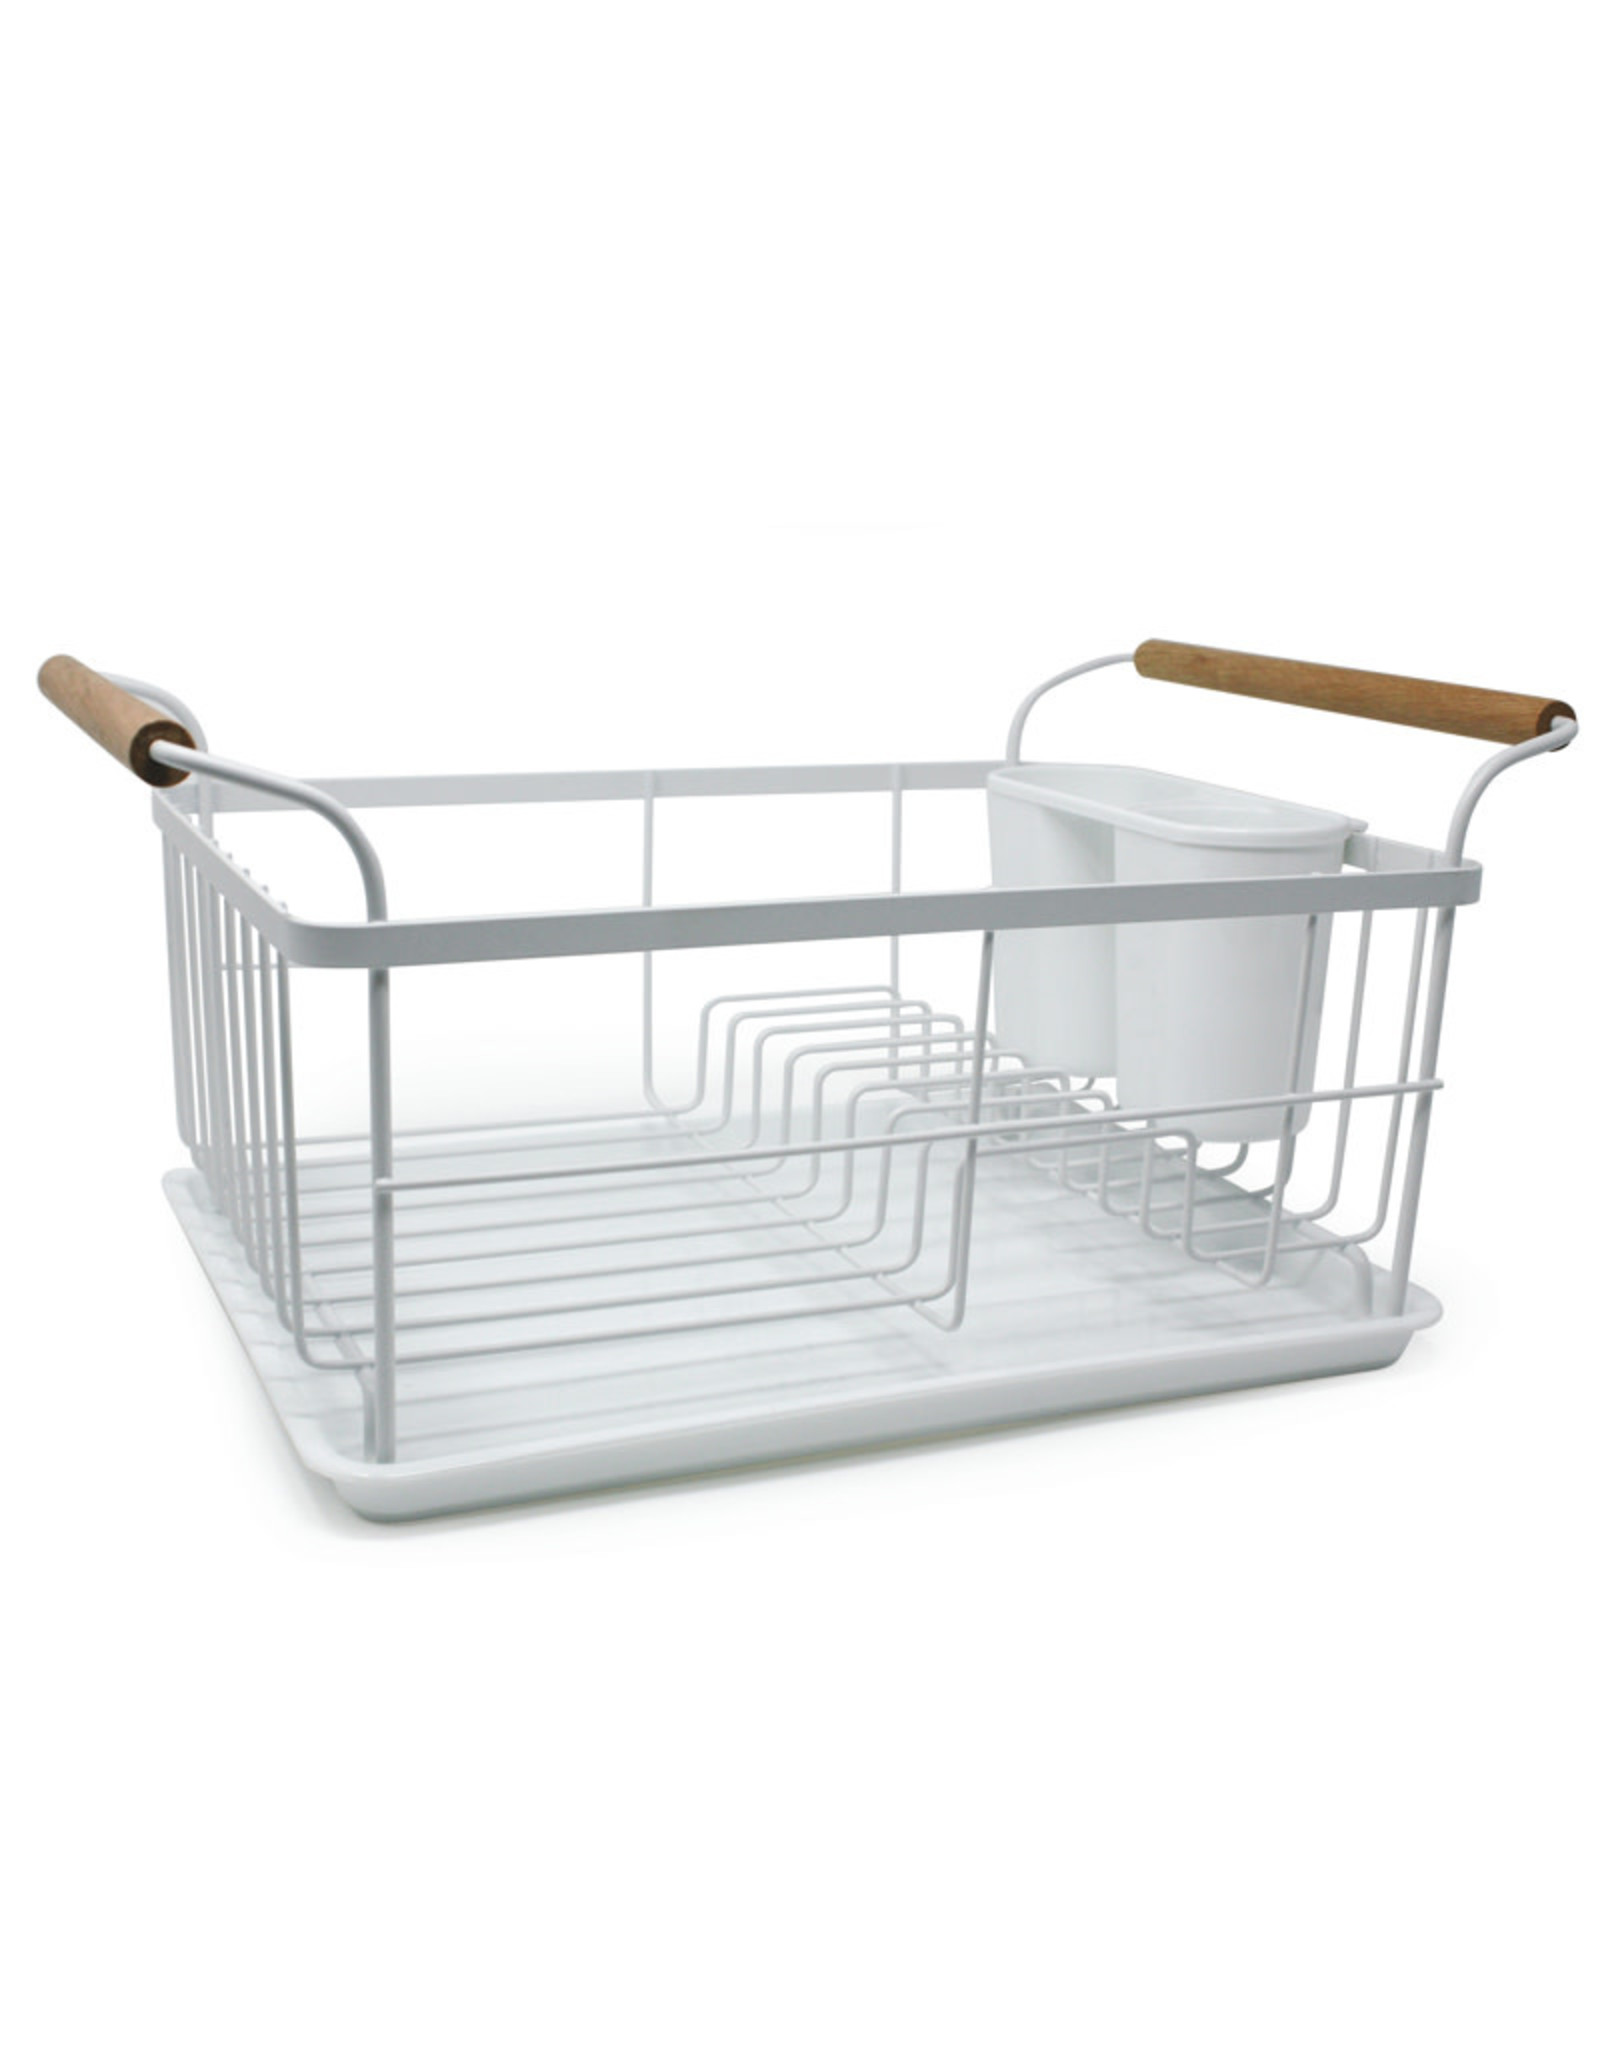 Danesco Danesco - Dish Rack with Drain Board and Wood Handles